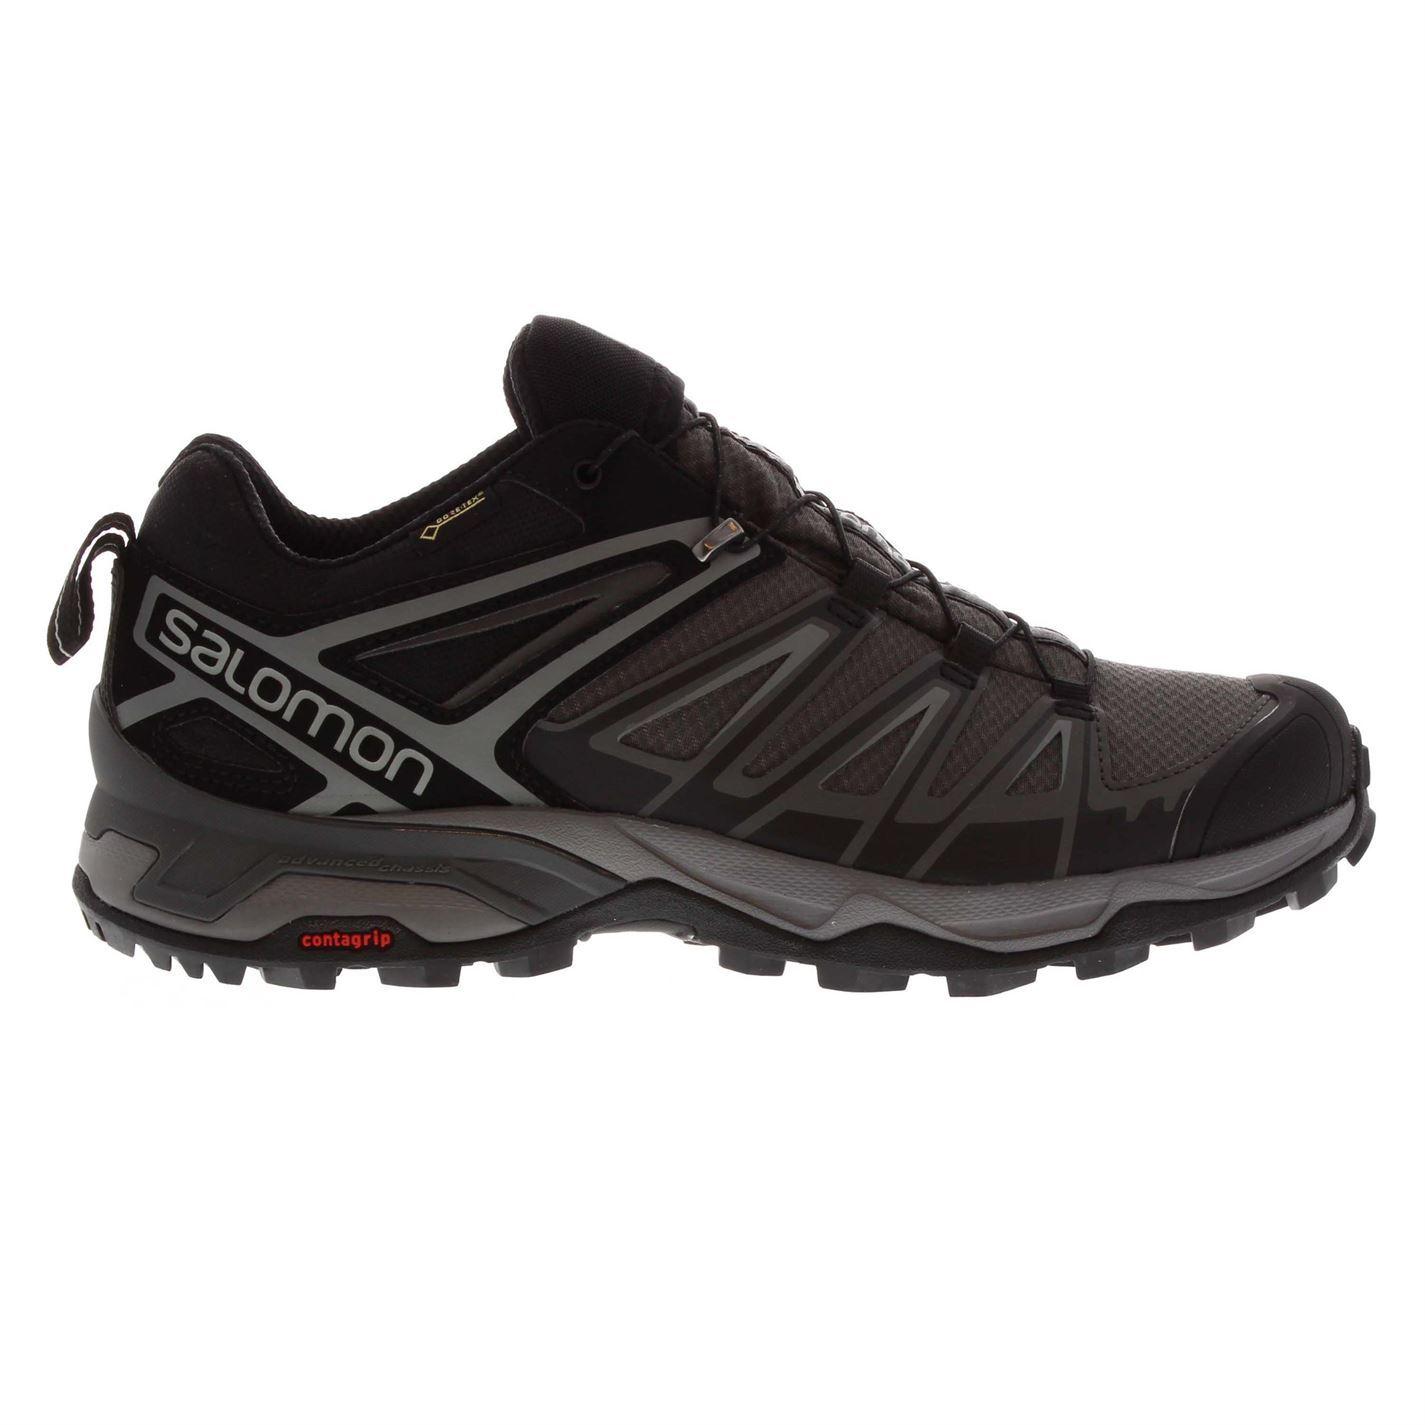 Salomon X Ultra 3 GTX Low Walking Shoes